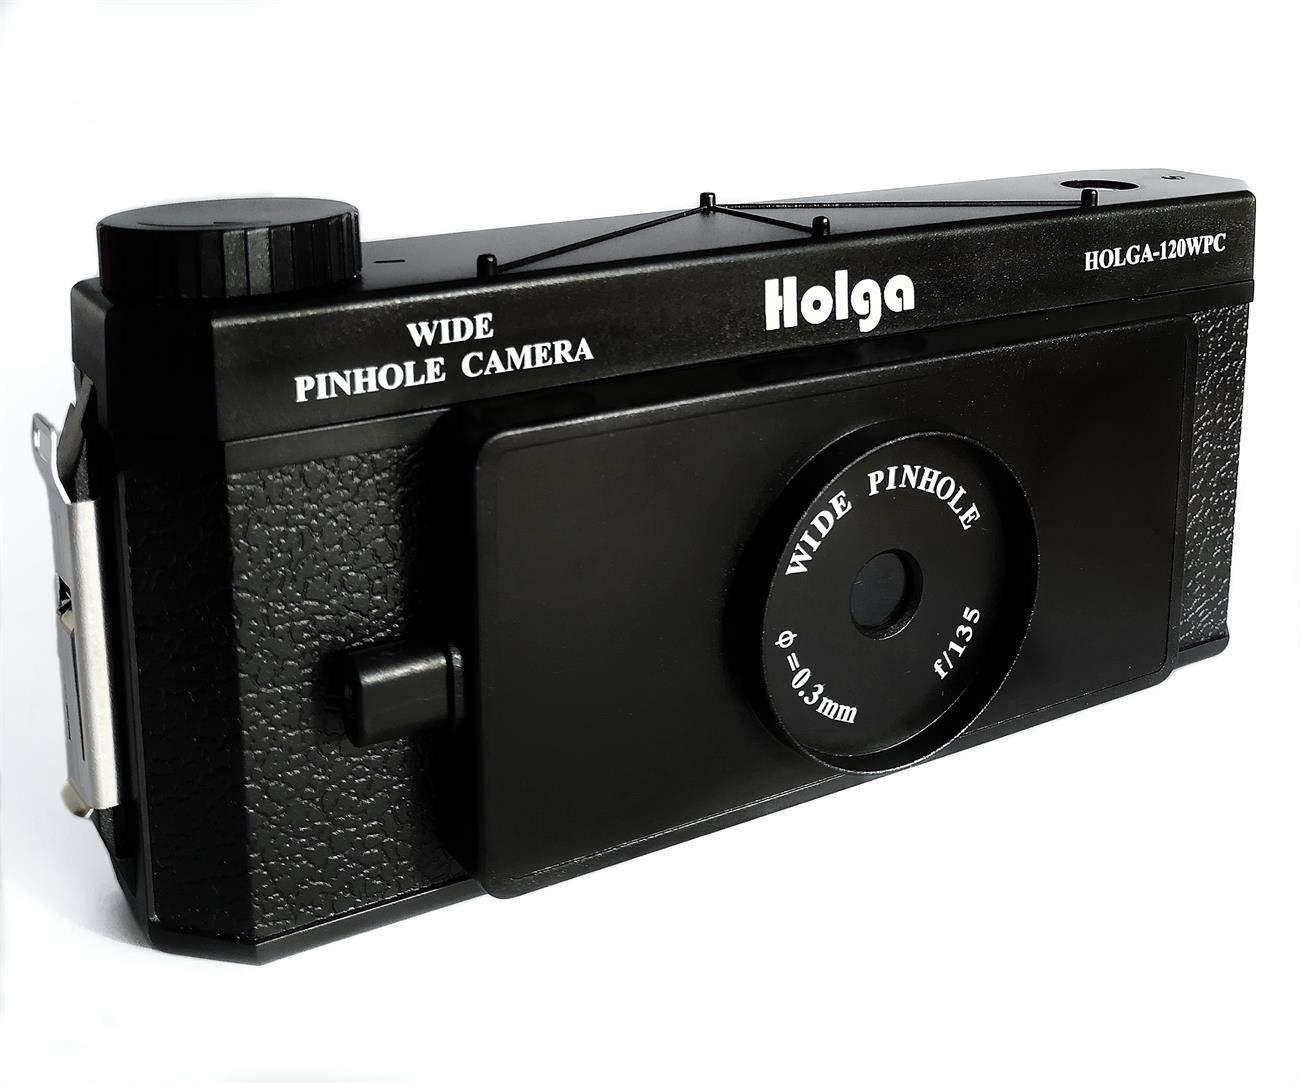 Holga 120 WPC Panoramic Pin Hole Camera Wide Format Film Lomo Camera Black (Renewed) by Holga